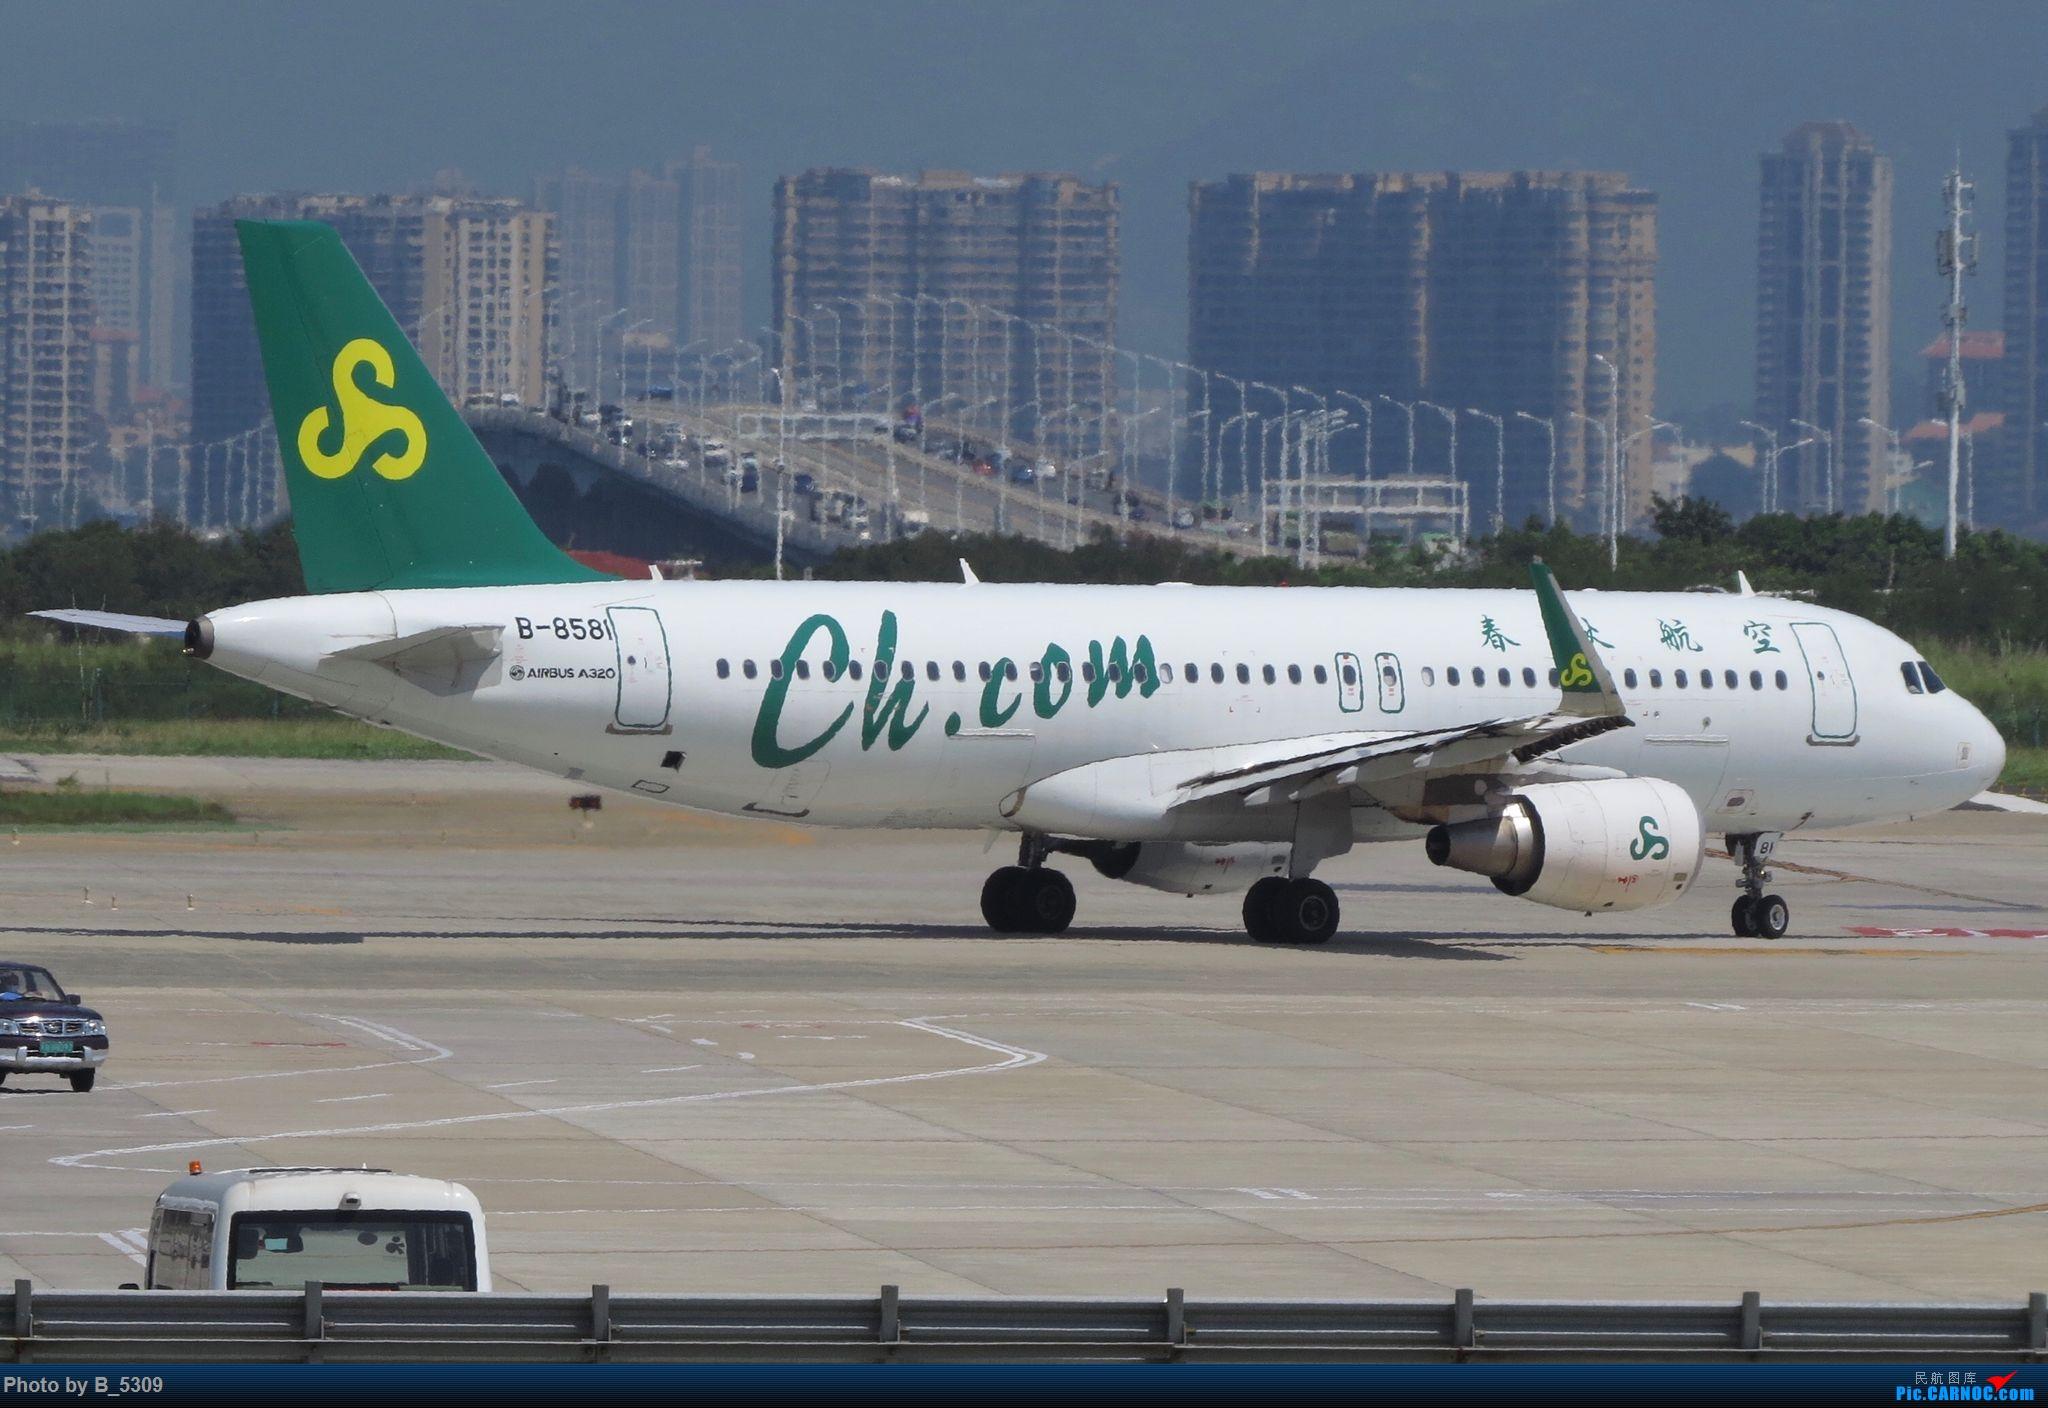 Re:[原创]逮KLM的大中午… AIRBUS A320-200 B-8581 中国厦门高崎国际机场